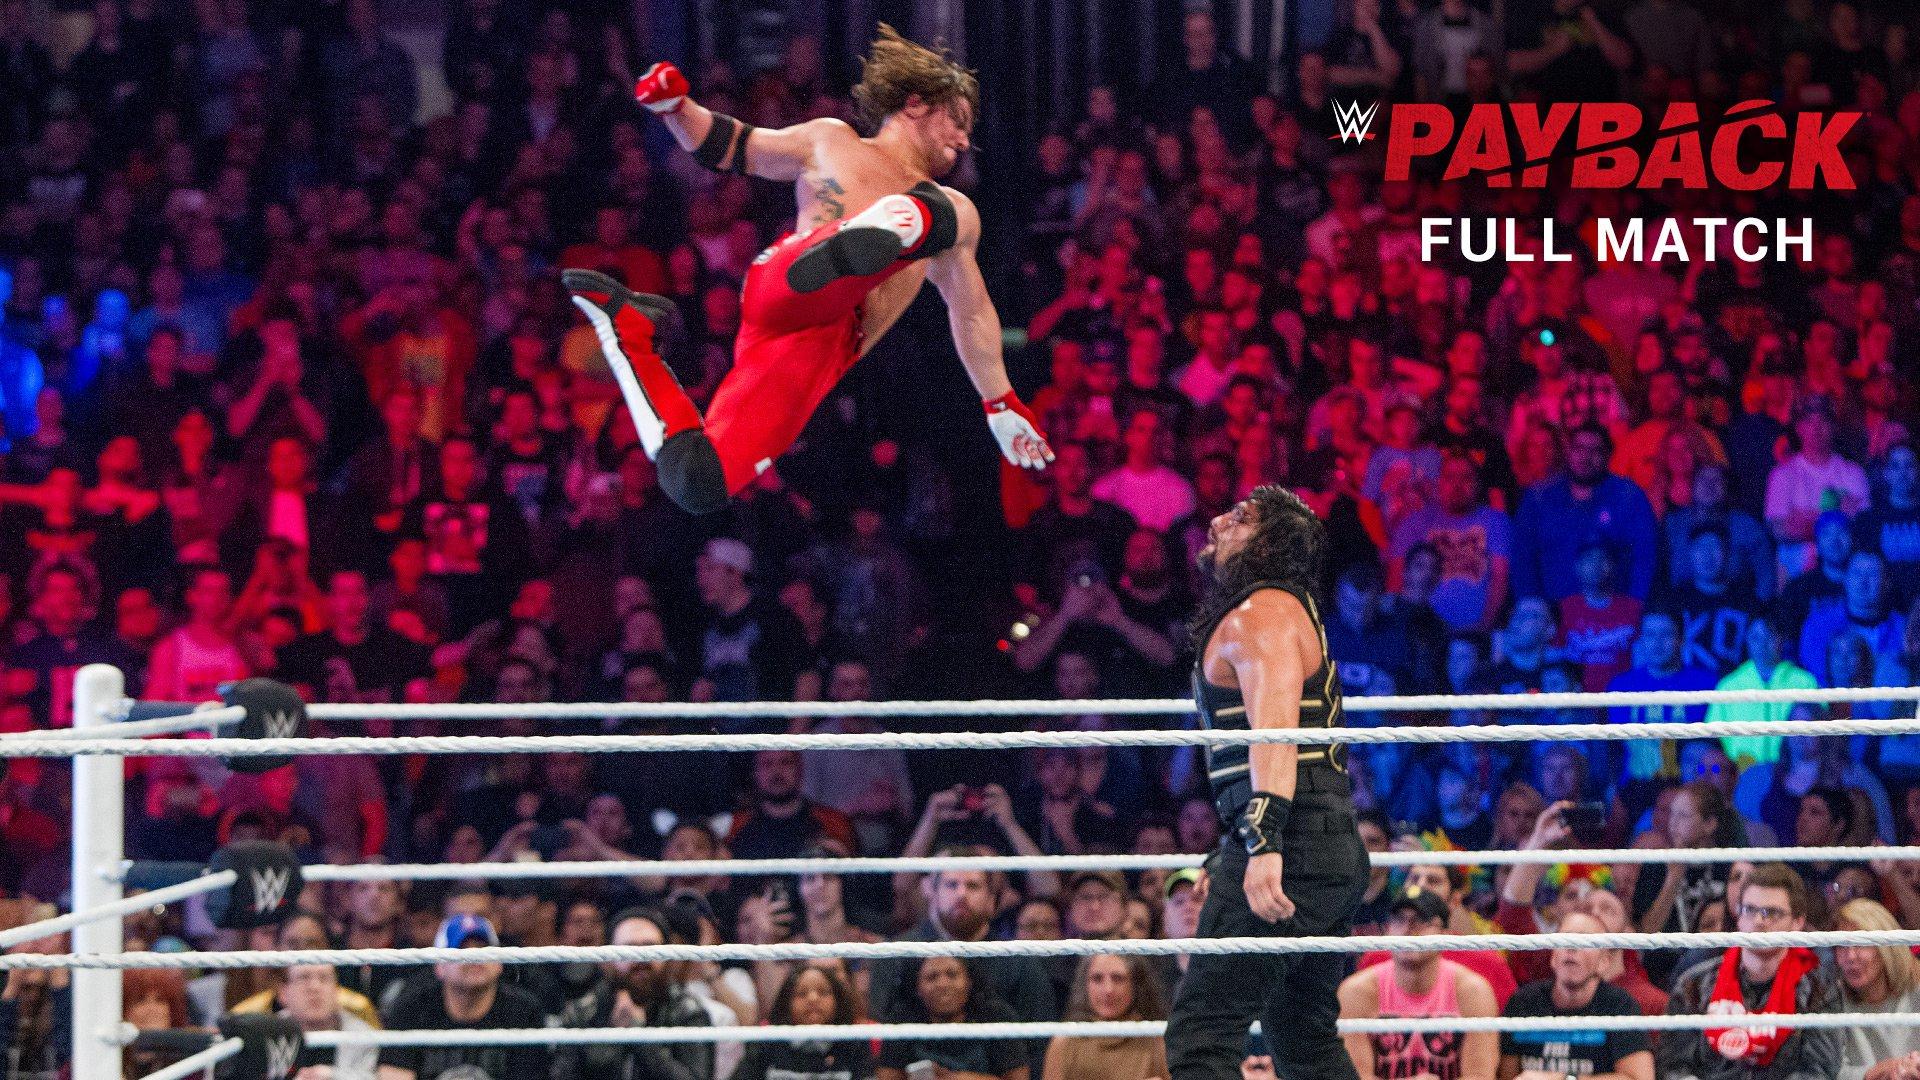 AJ Styles vs. Roman Reigns - WWE World Heavyweight Title Match: WWE Payback 2016 (Full Match - WWE Network Exclusive)